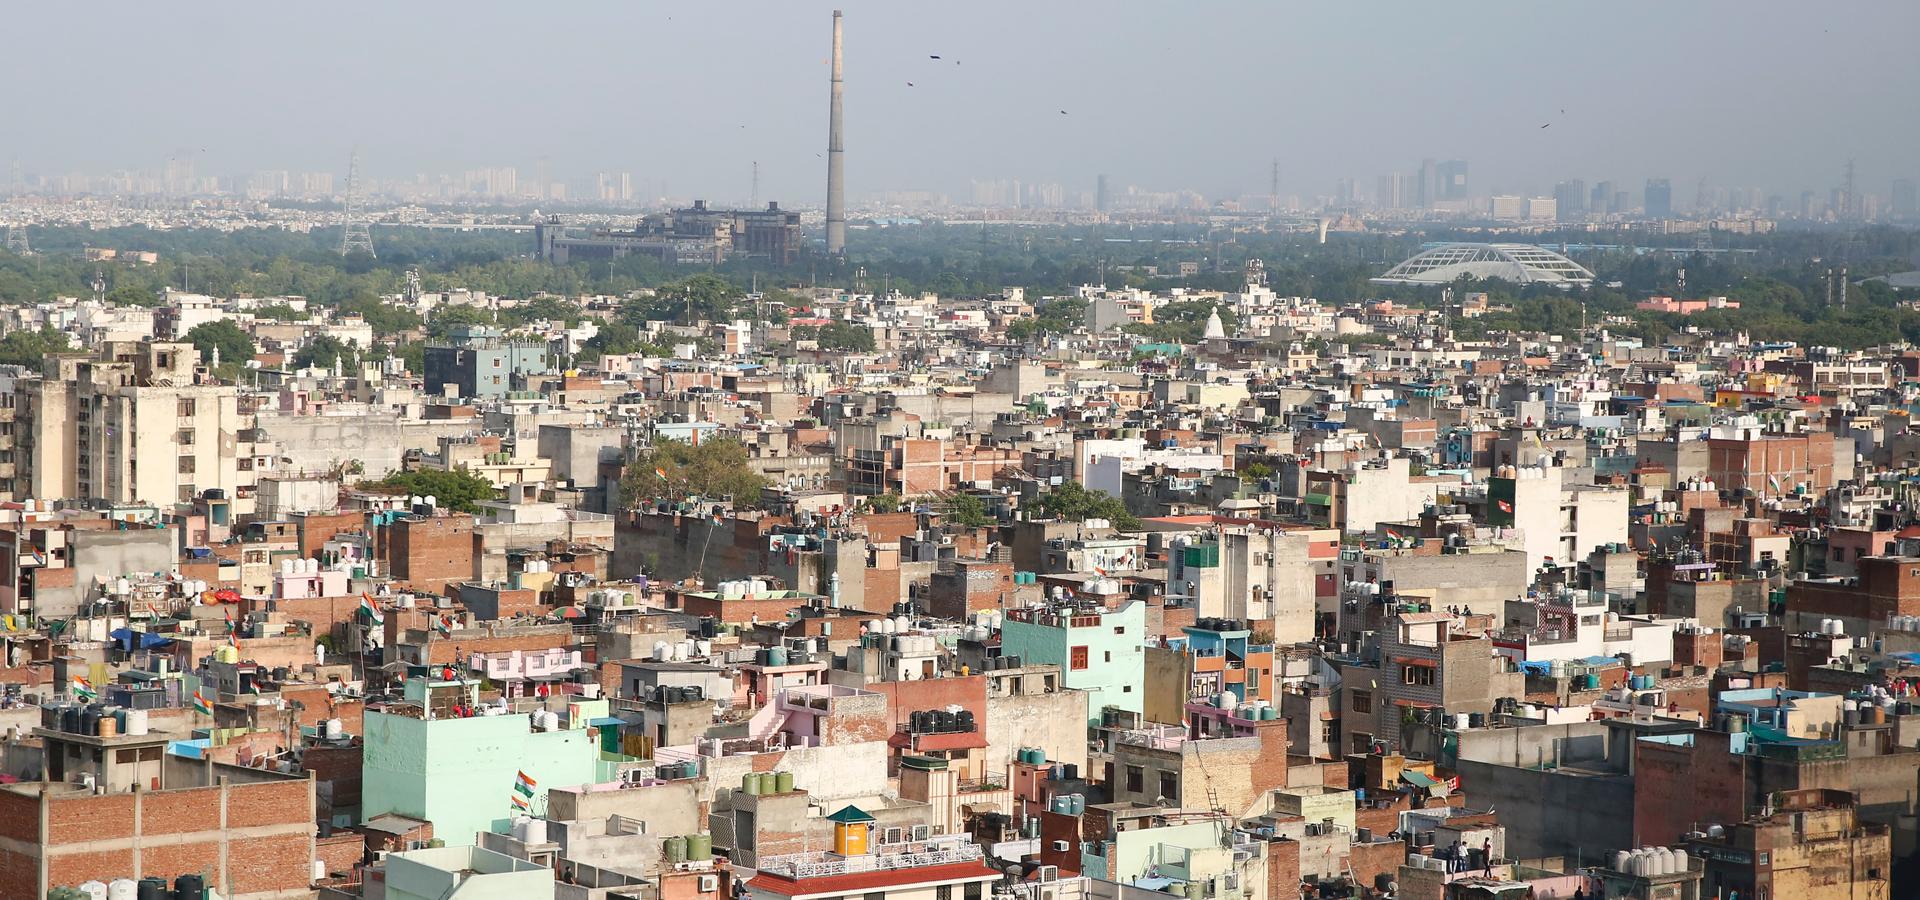 Peer-to-peer advisory in Delhi, India